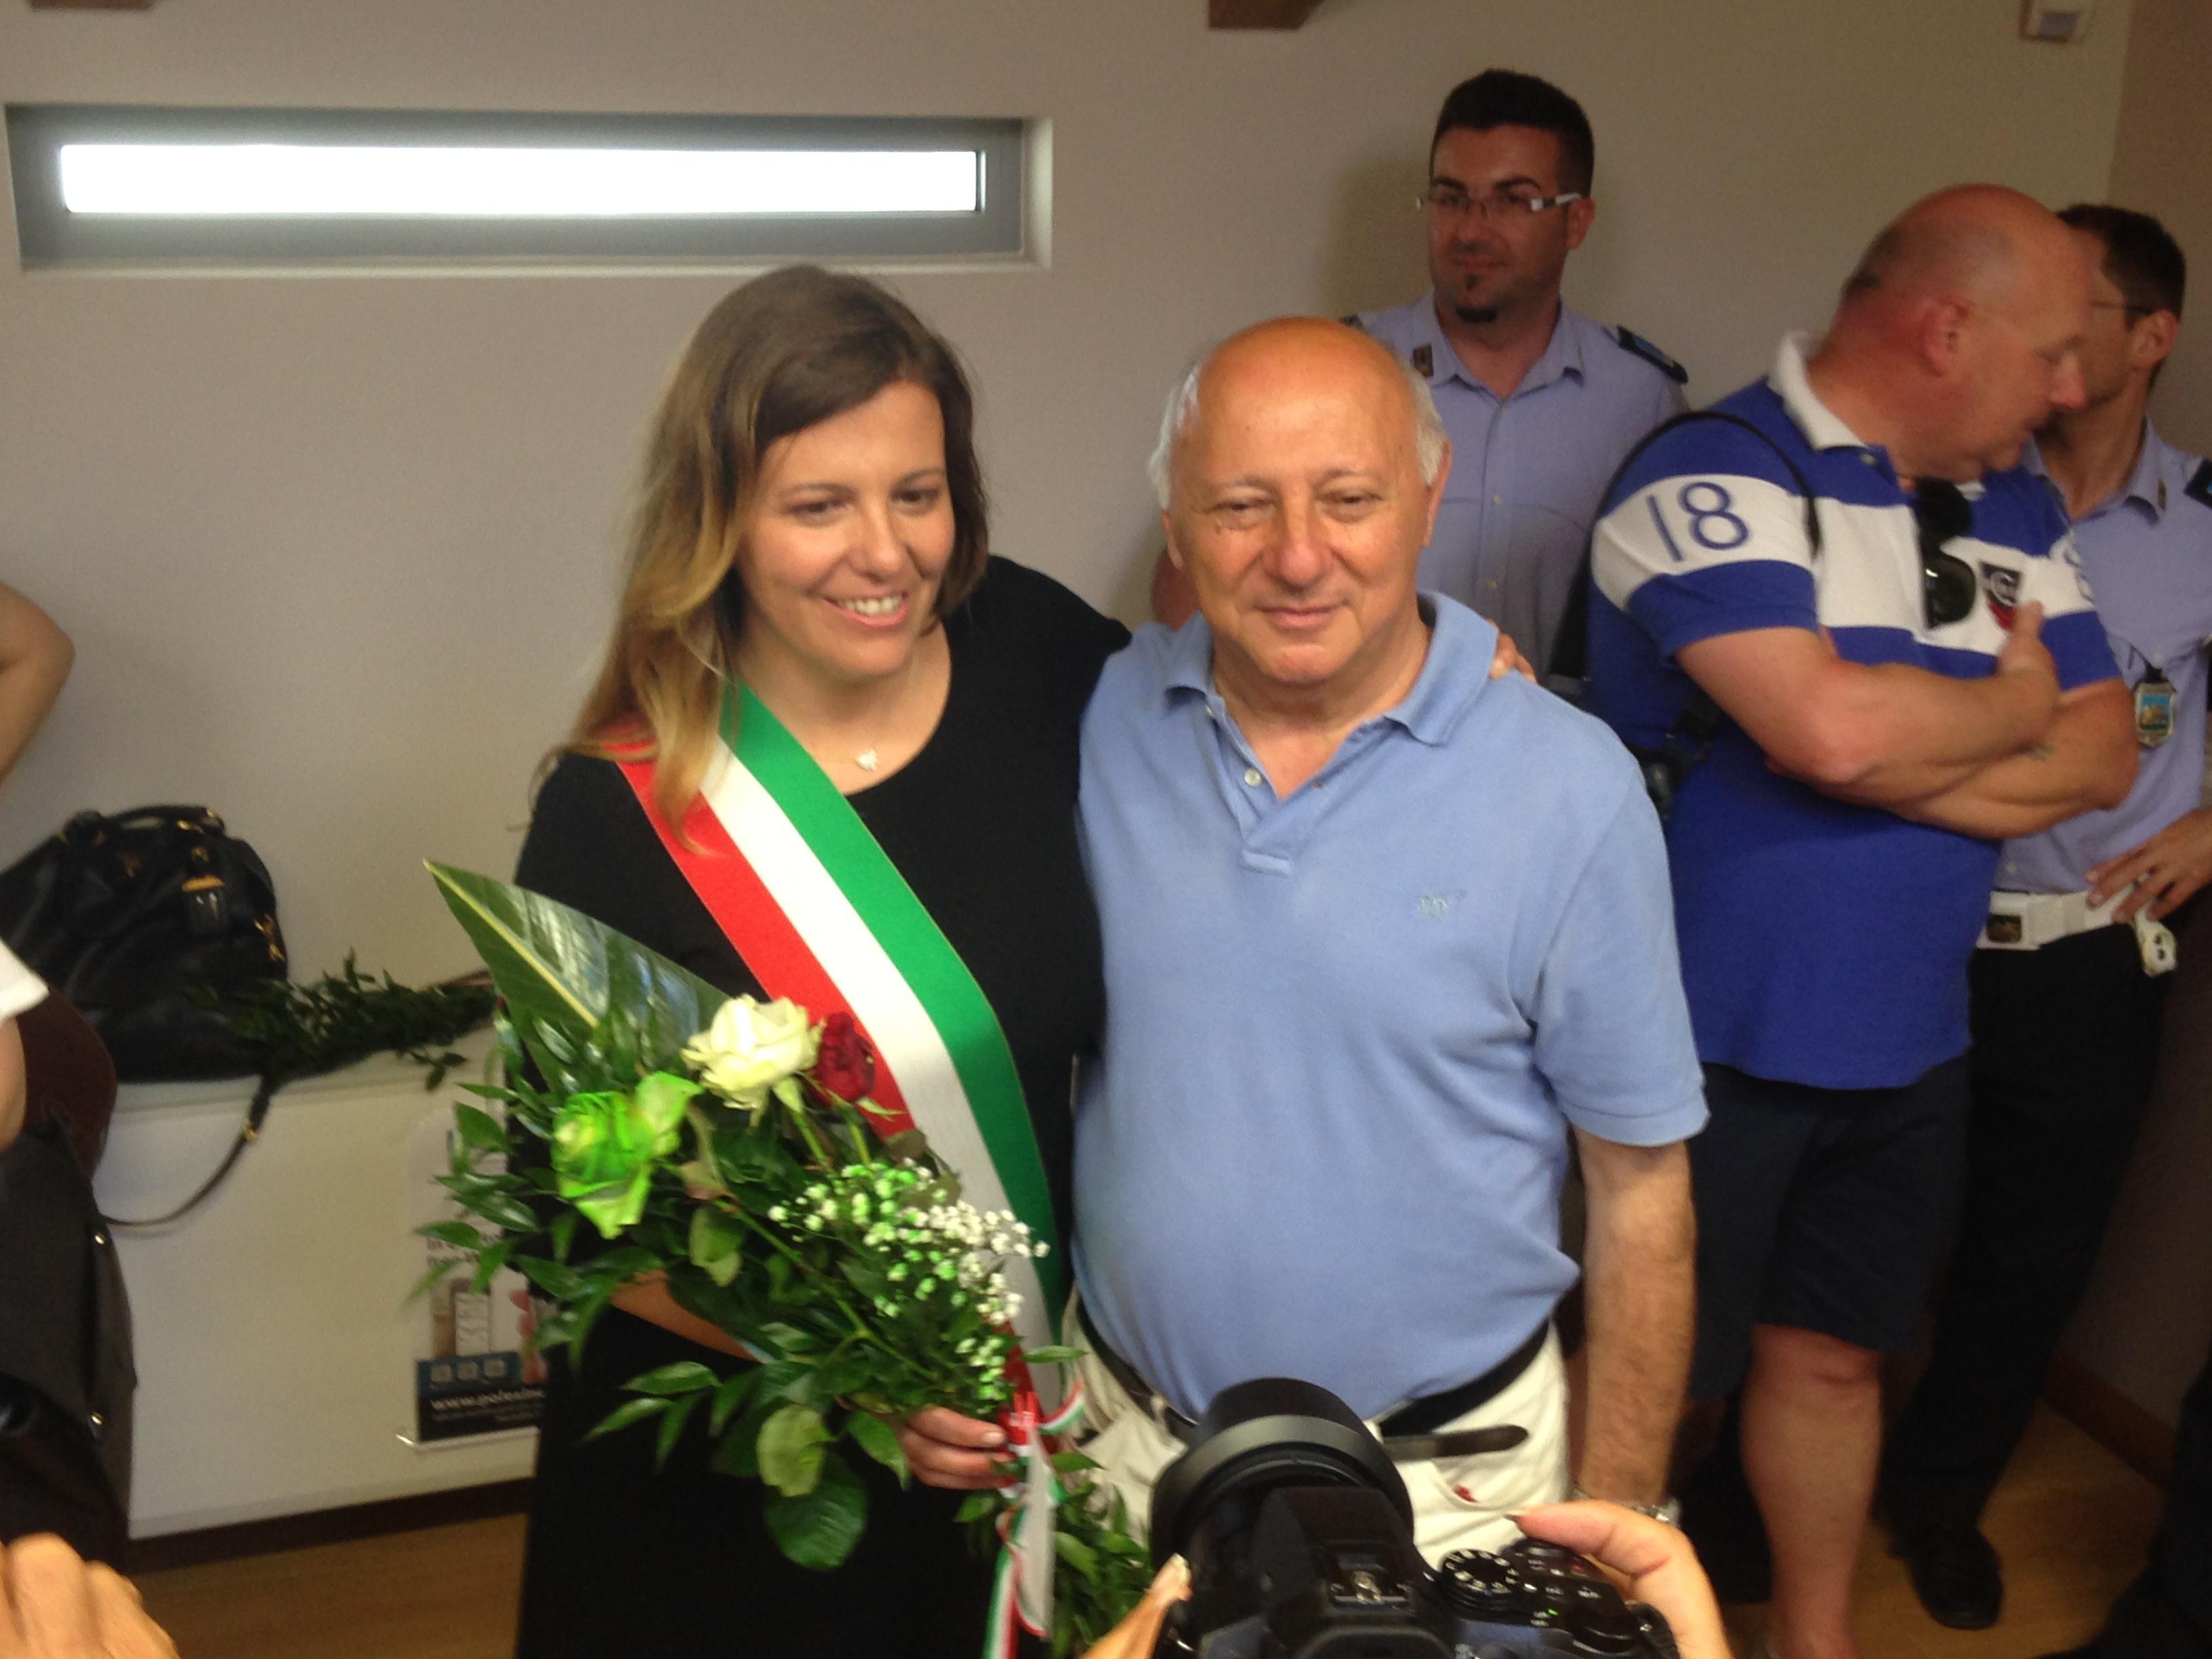 Maura Veronese, primo sindaco donna a Porto Viro - La PiazzaWeb